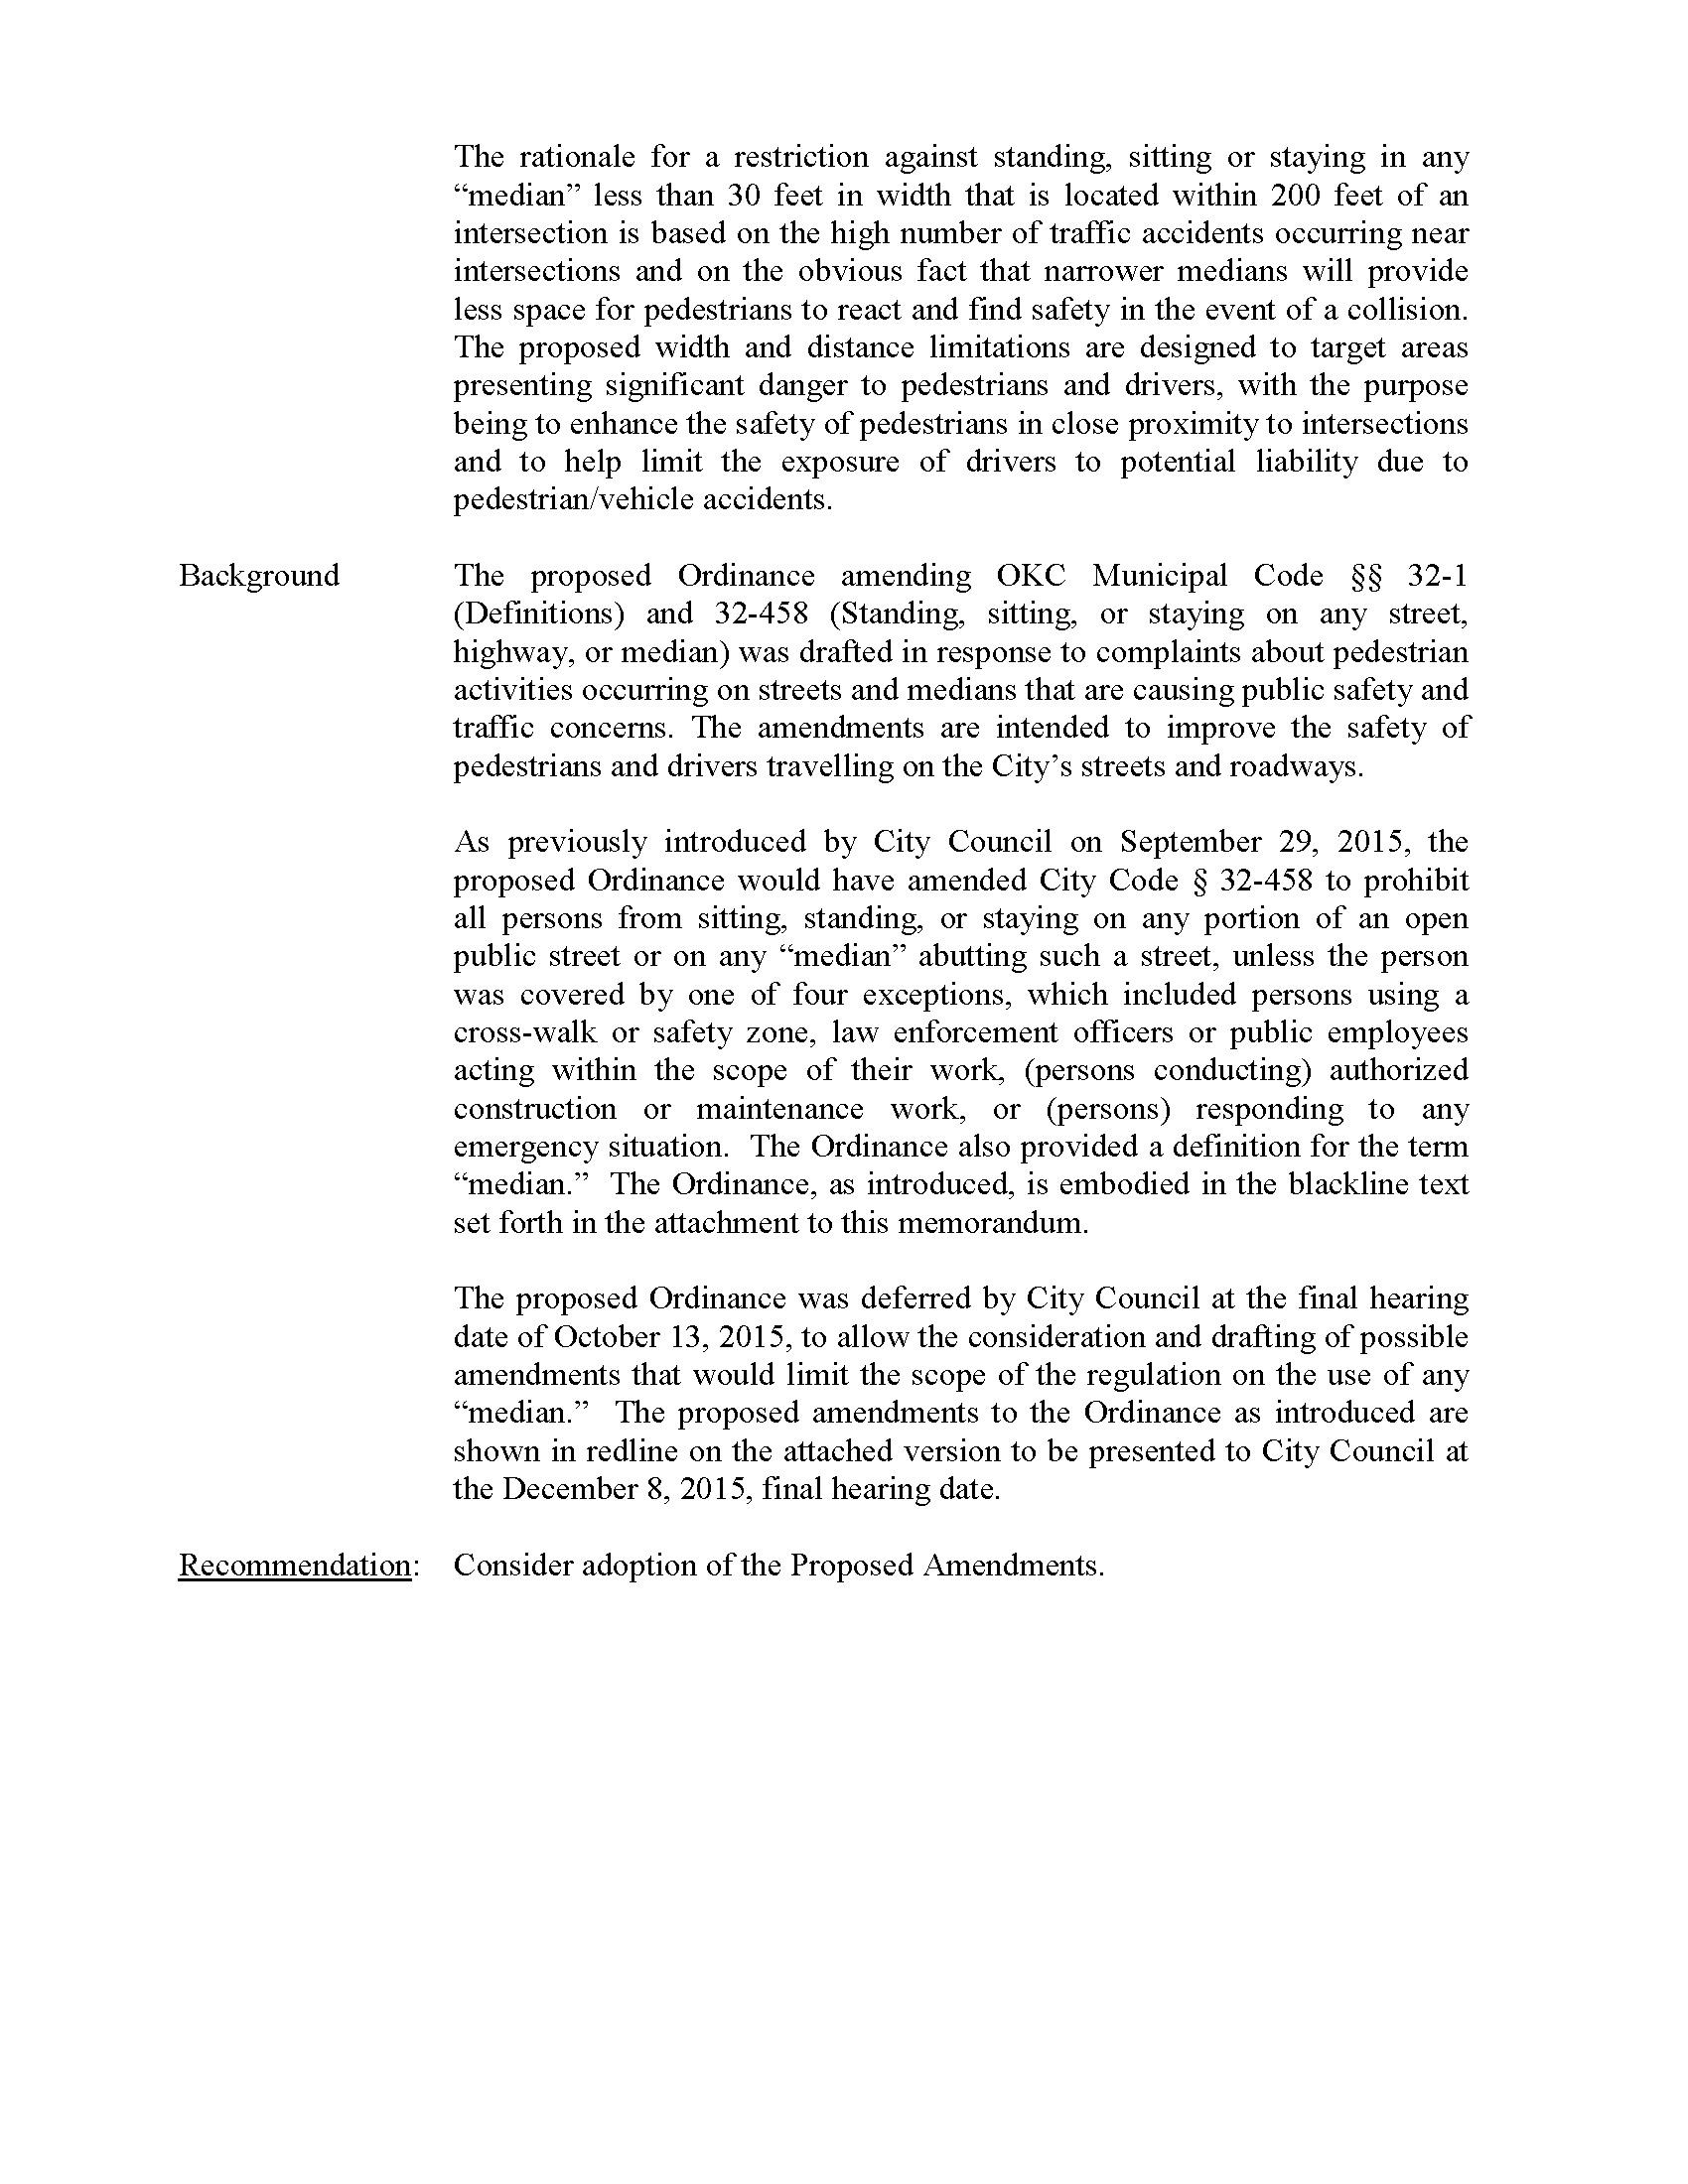 Median_definition_Page_2.jpg